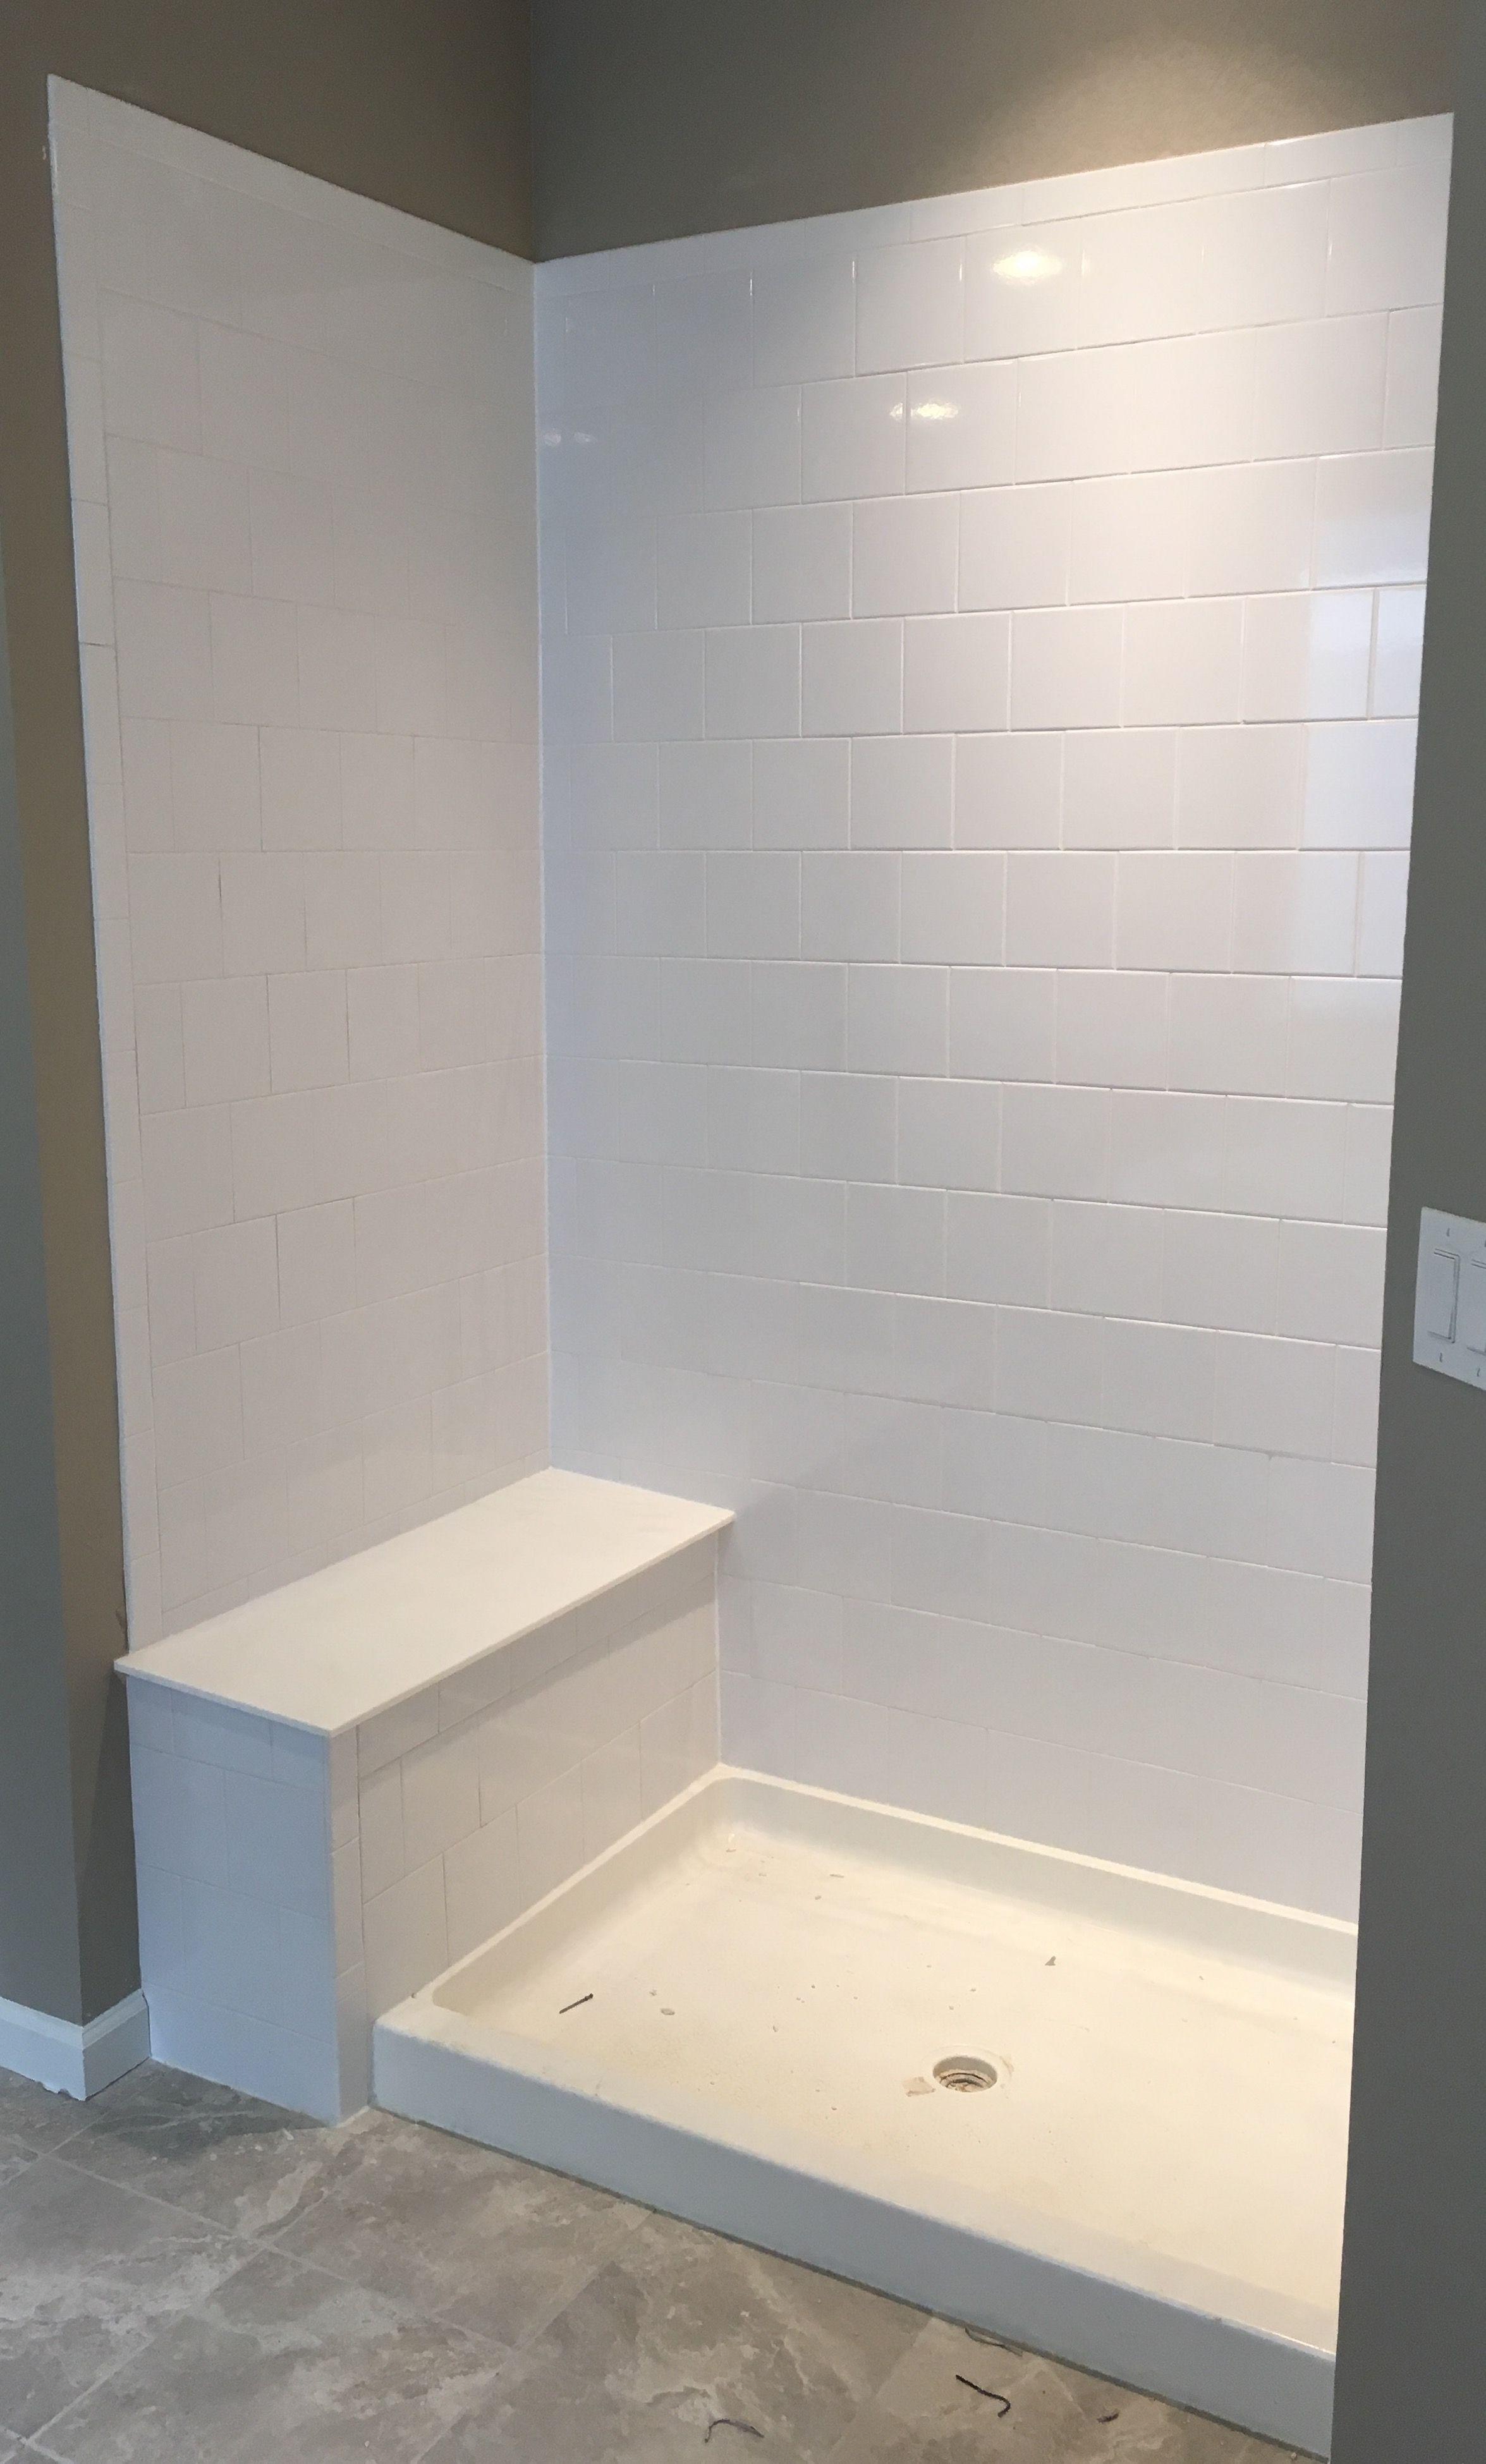 Emser Semplice 6x6 Brickset Guest Bedrooms Bath Inspiration Master Bathroom